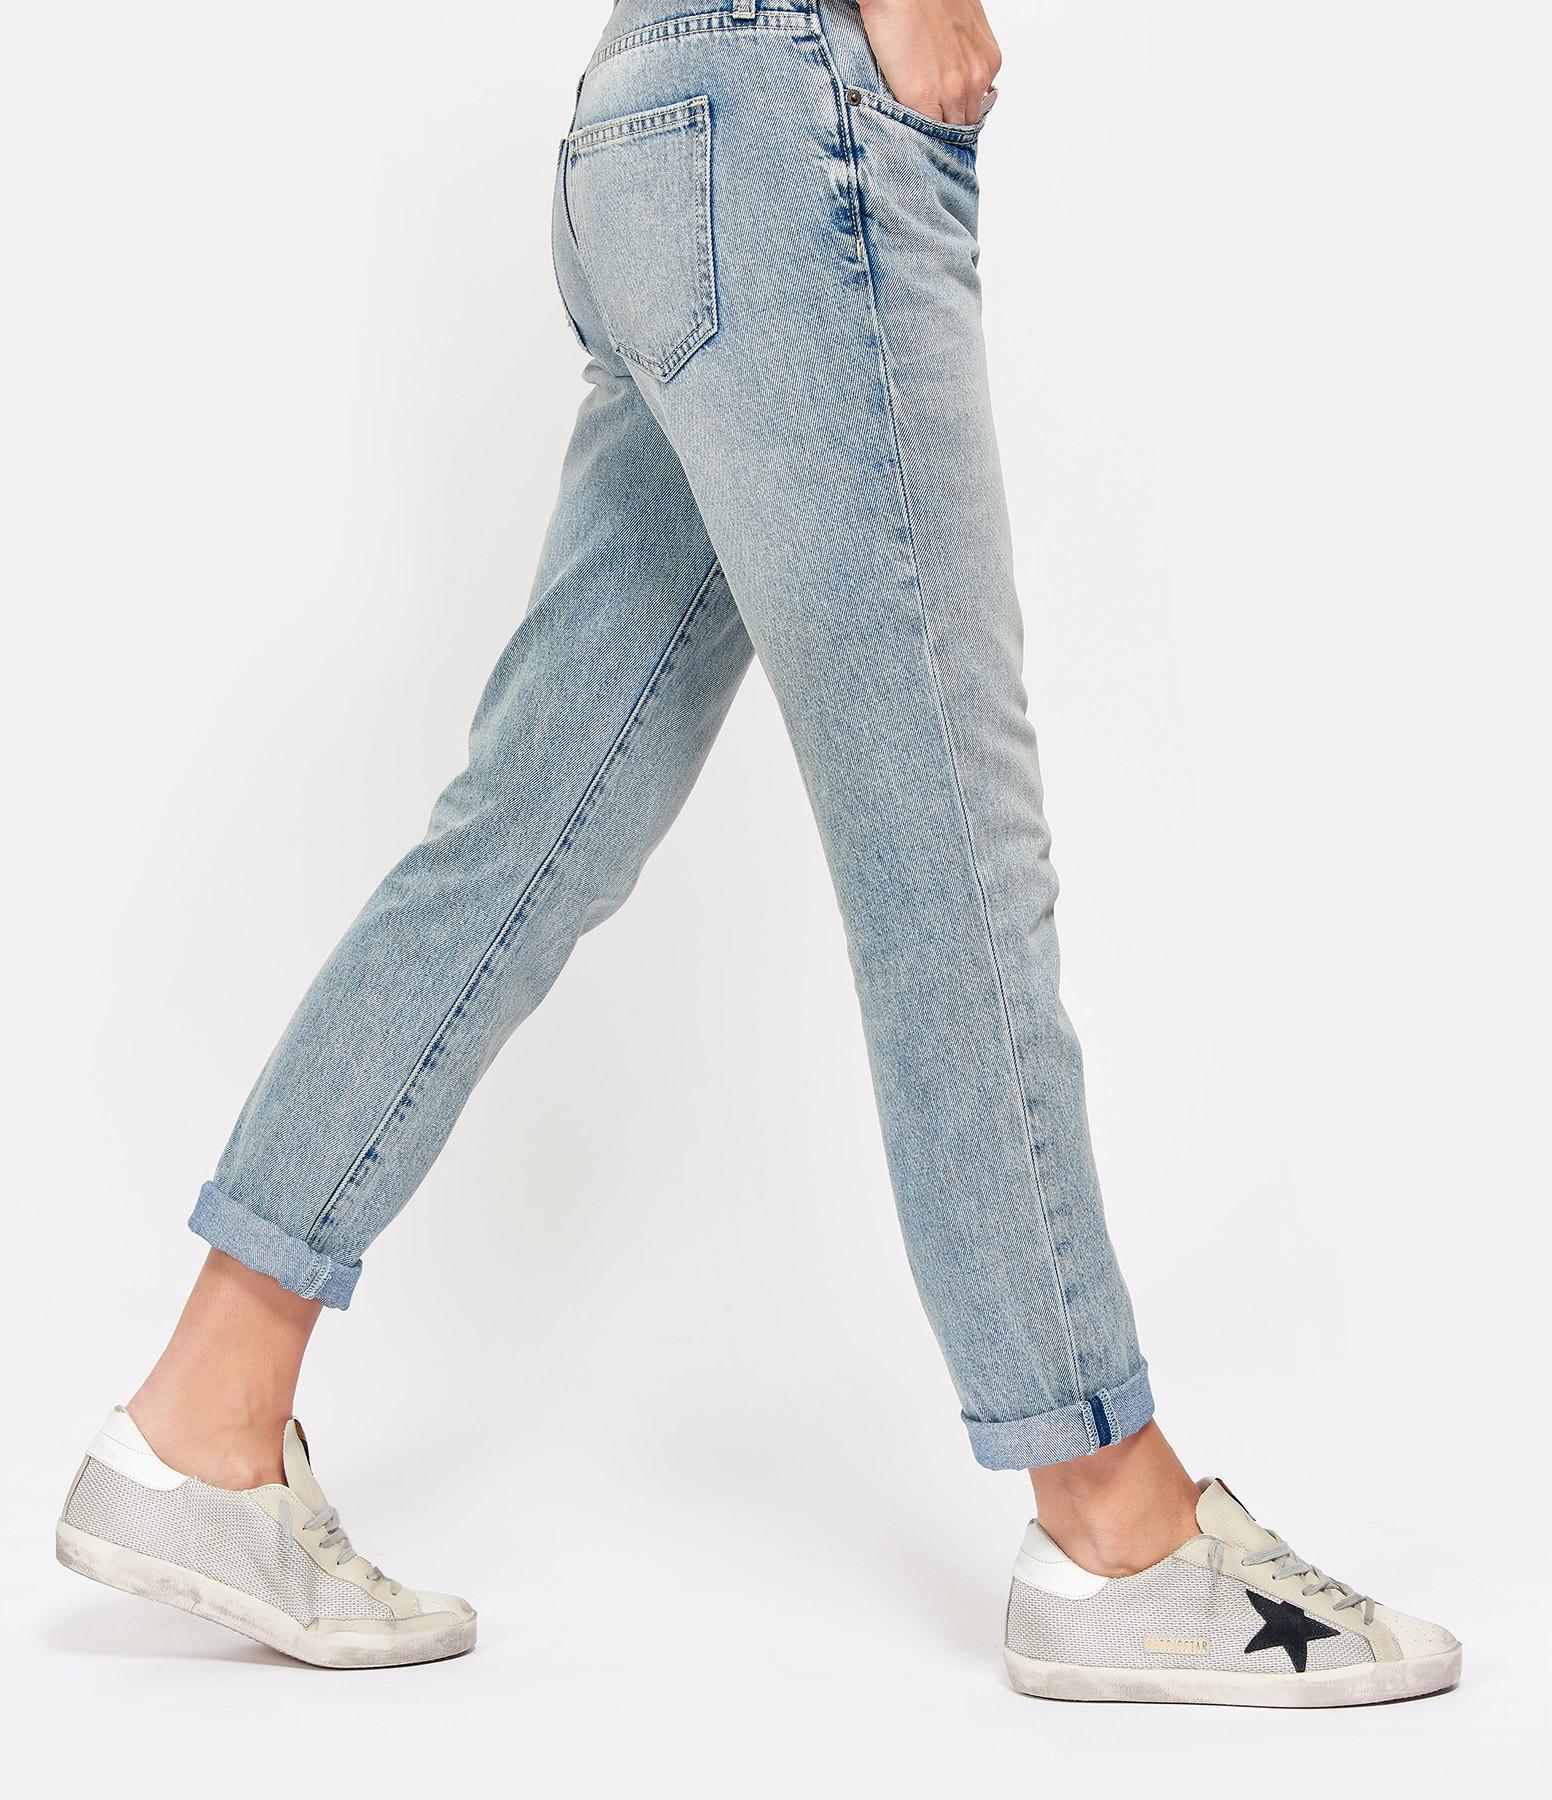 Sneakers Superstar Grey Cord Gum